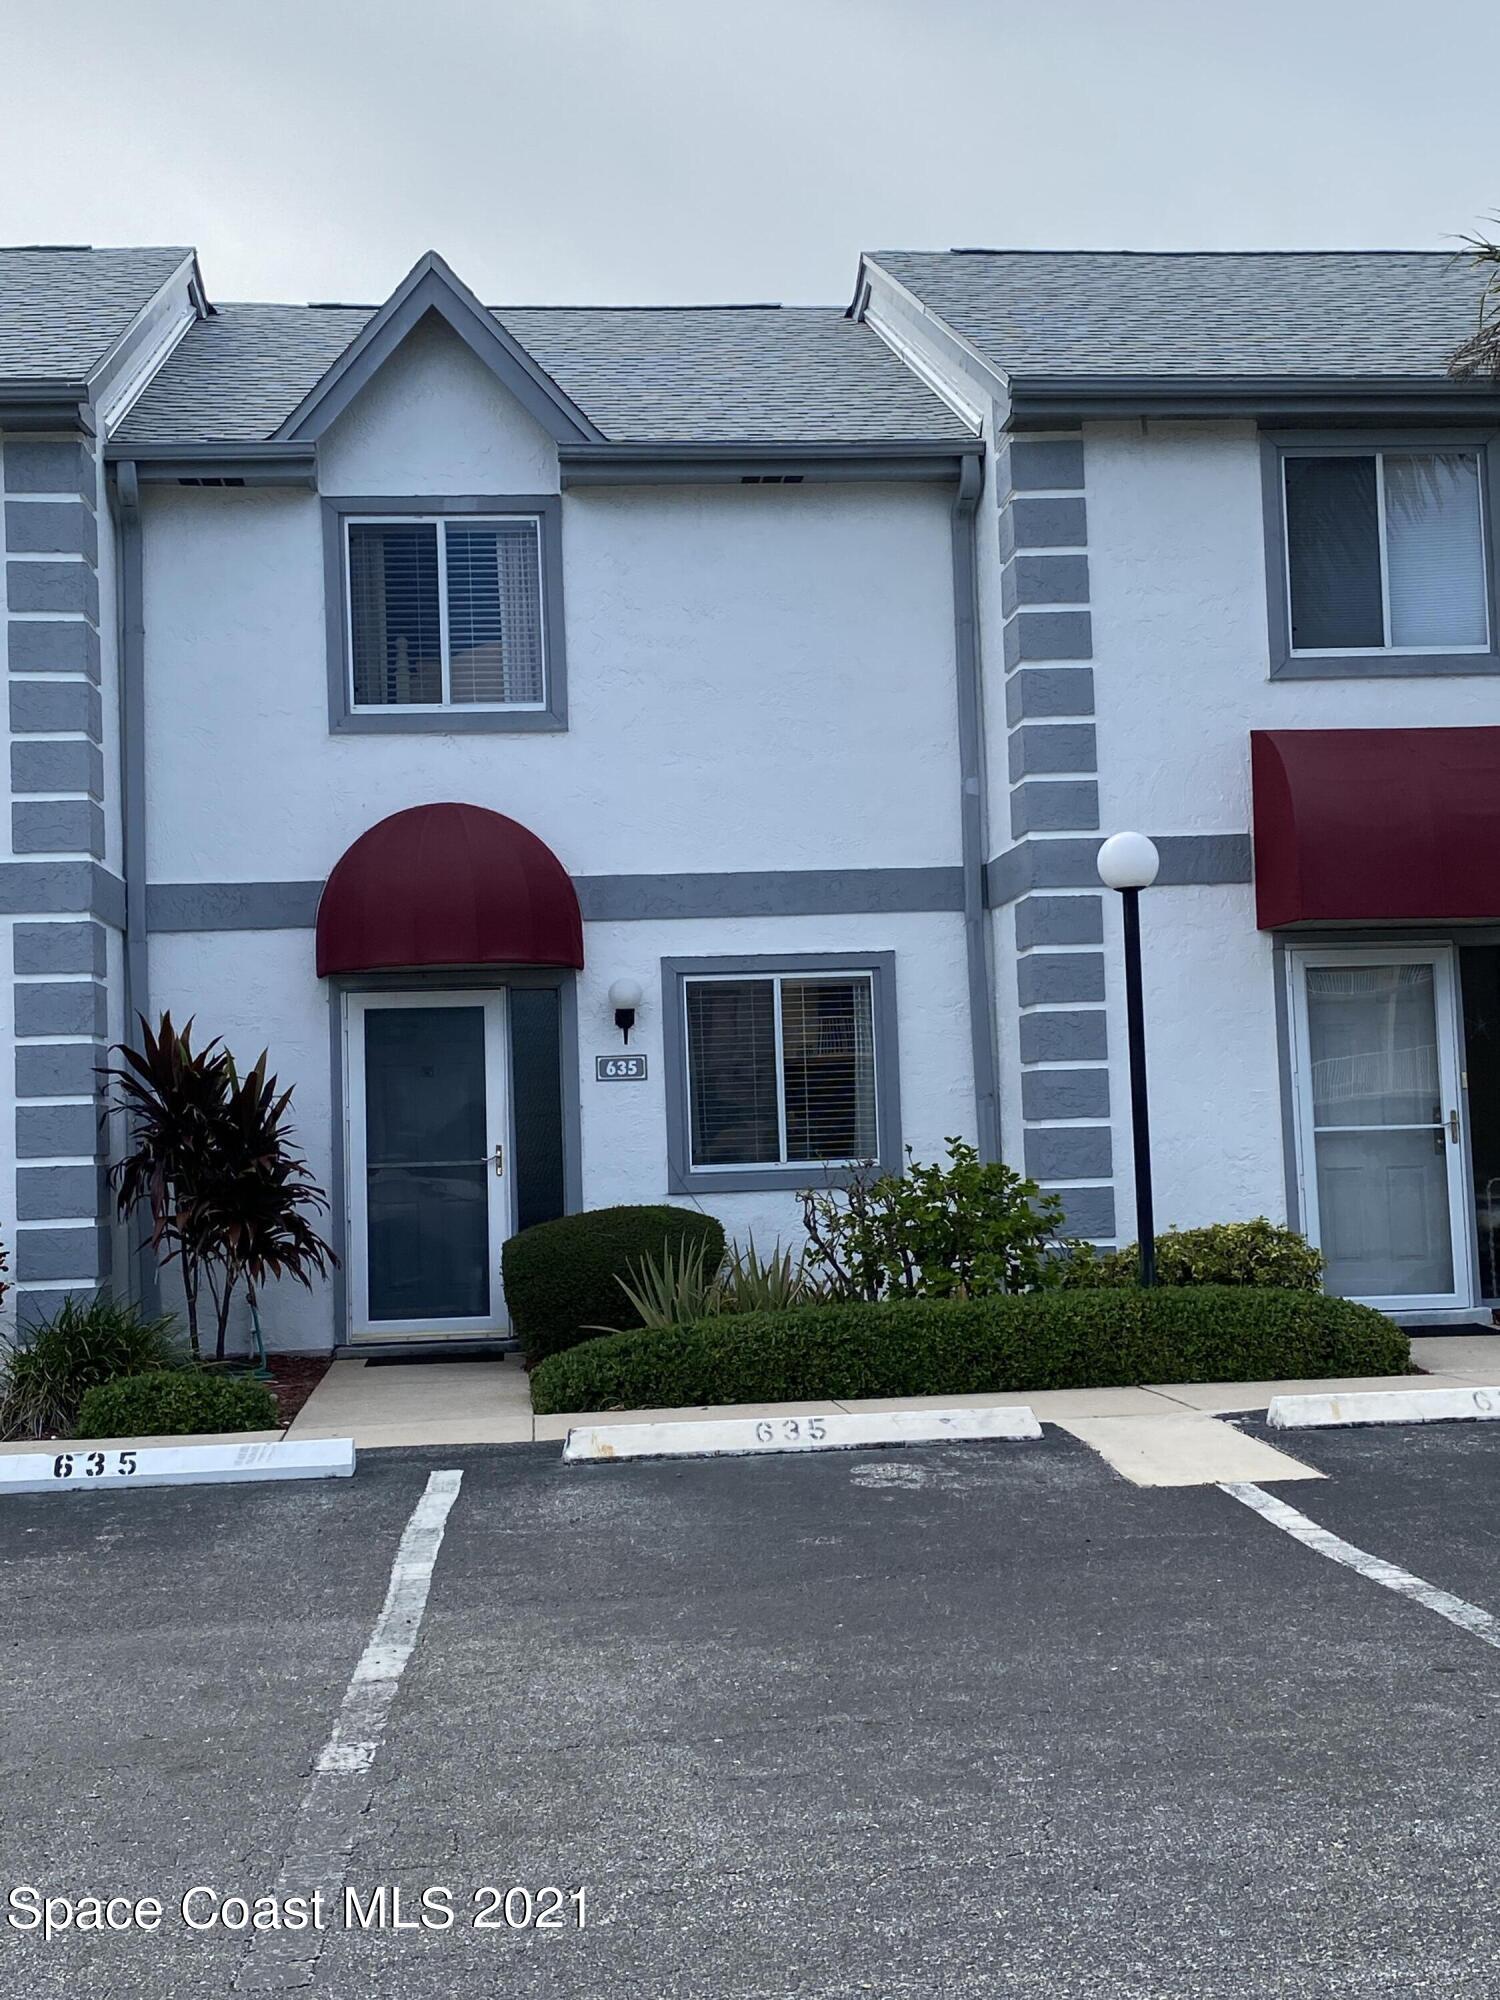 635 Seaport Blvd. Boulevard, Cape Canaveral, FL 32920